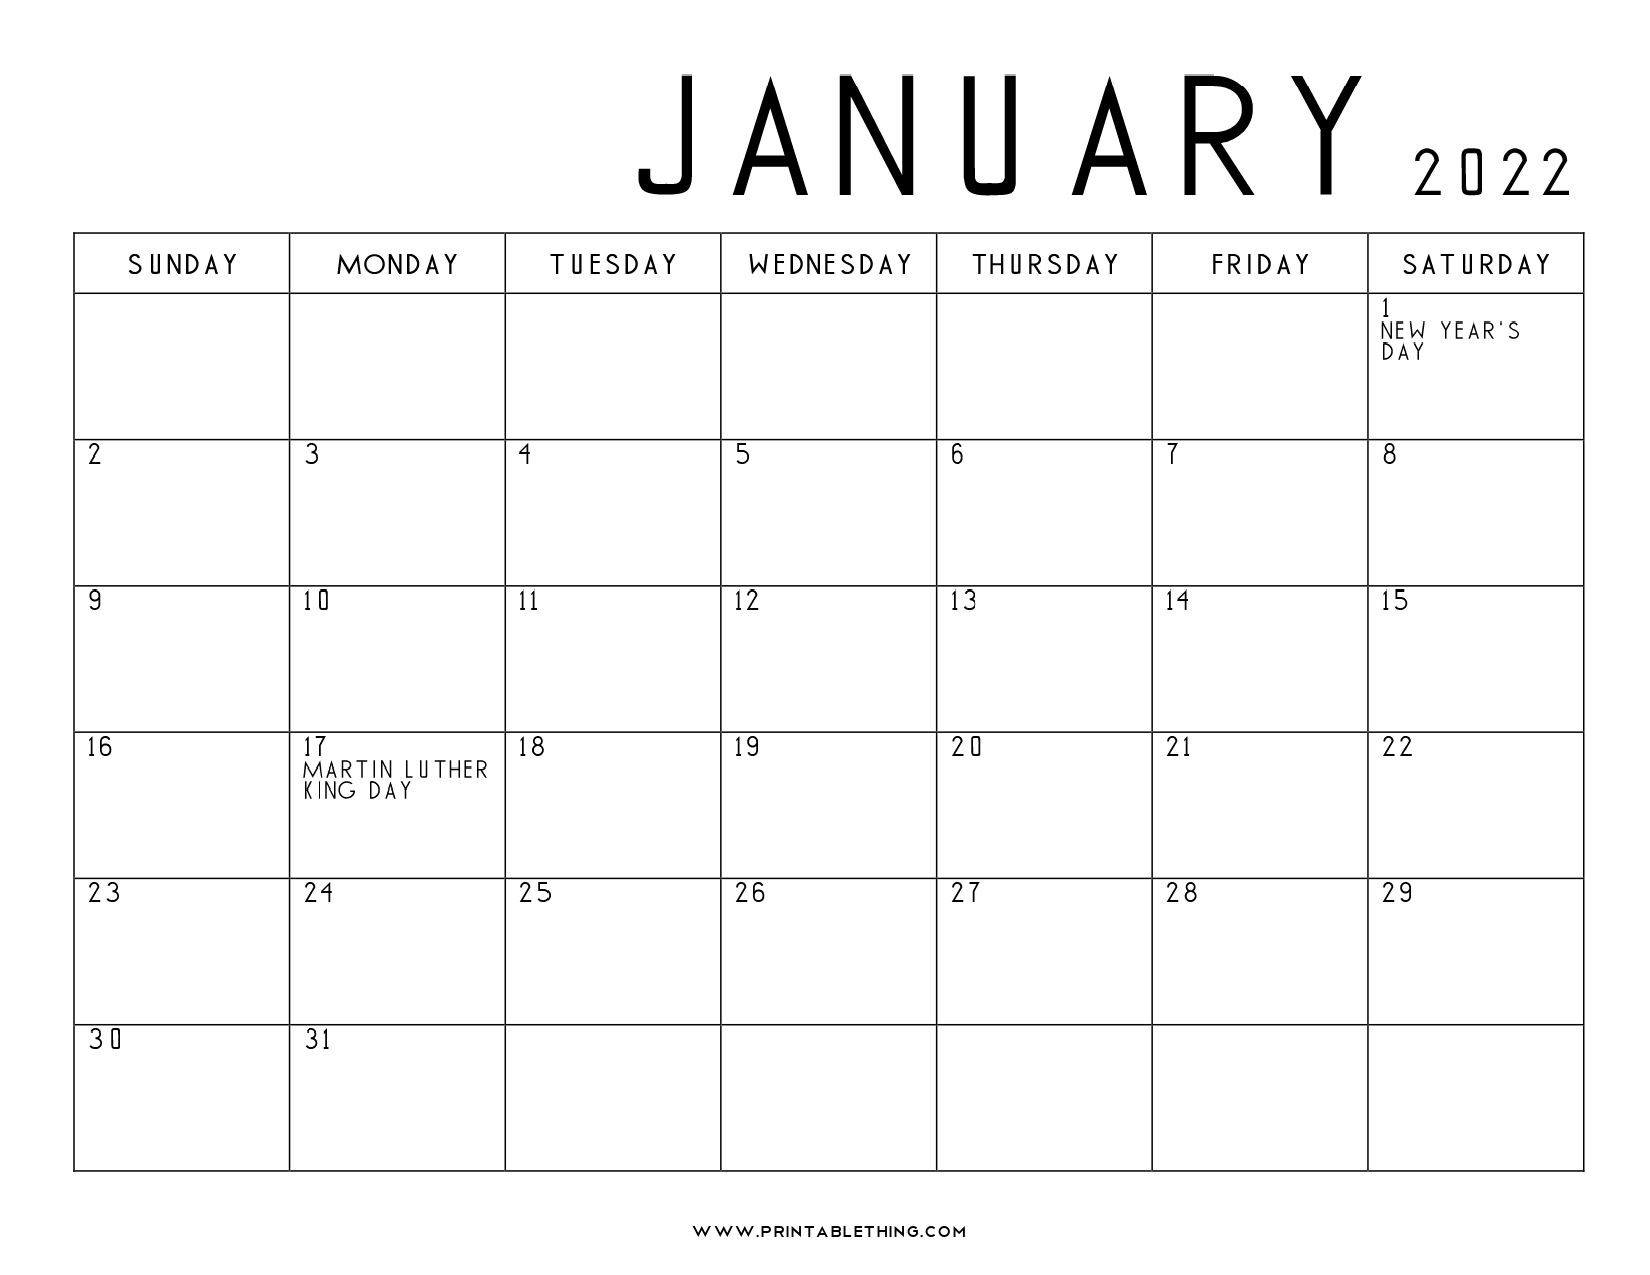 Free January 2022 Calendar.January 2022 Calendar Printable Pdf Us Holidays January 2023 2024